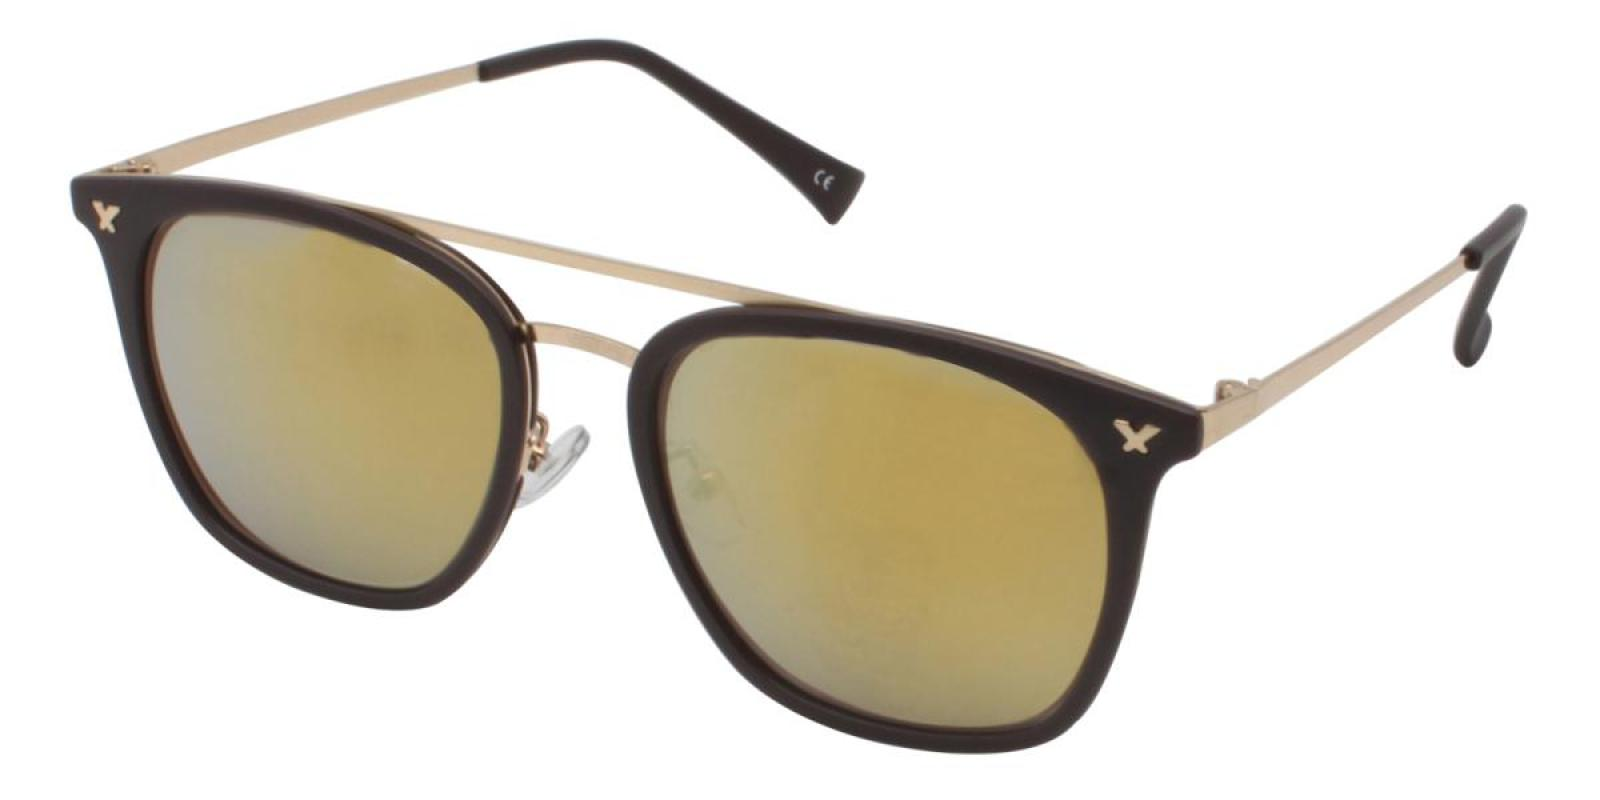 Seagual-Brown-Aviator-Metal / Combination / TR-Sunglasses-additional1